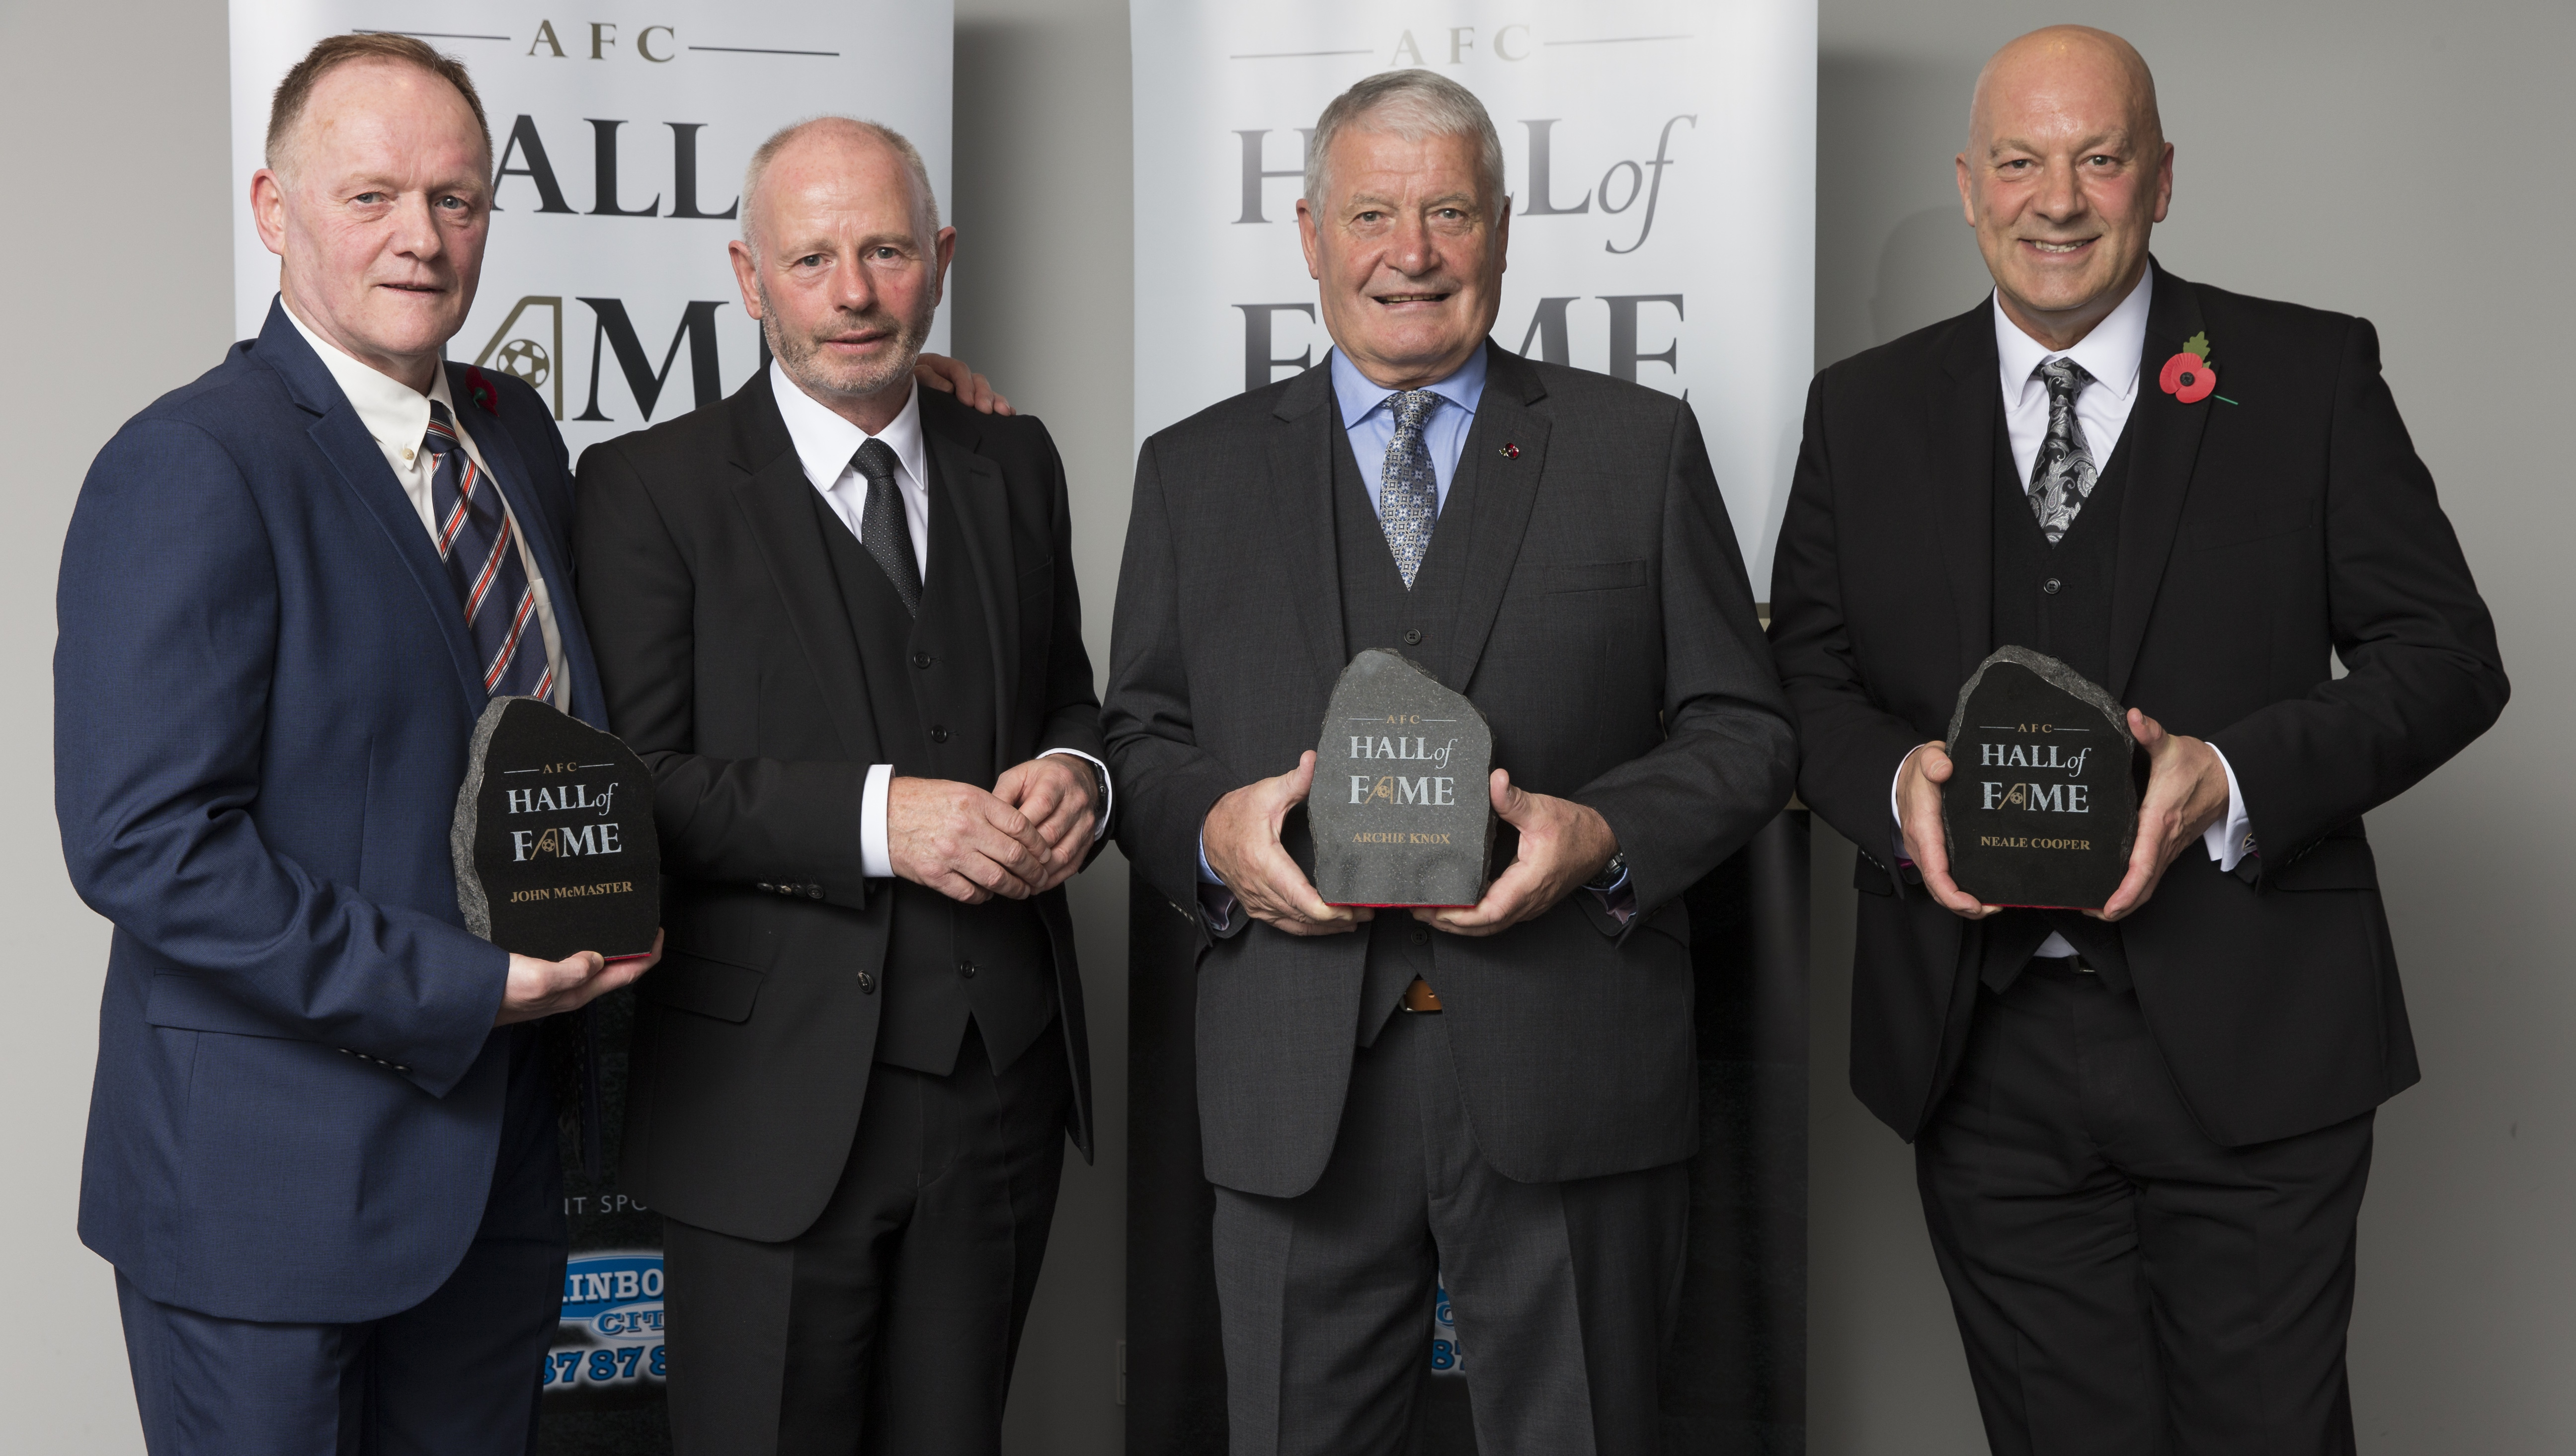 2017 AFC Hall of Fame